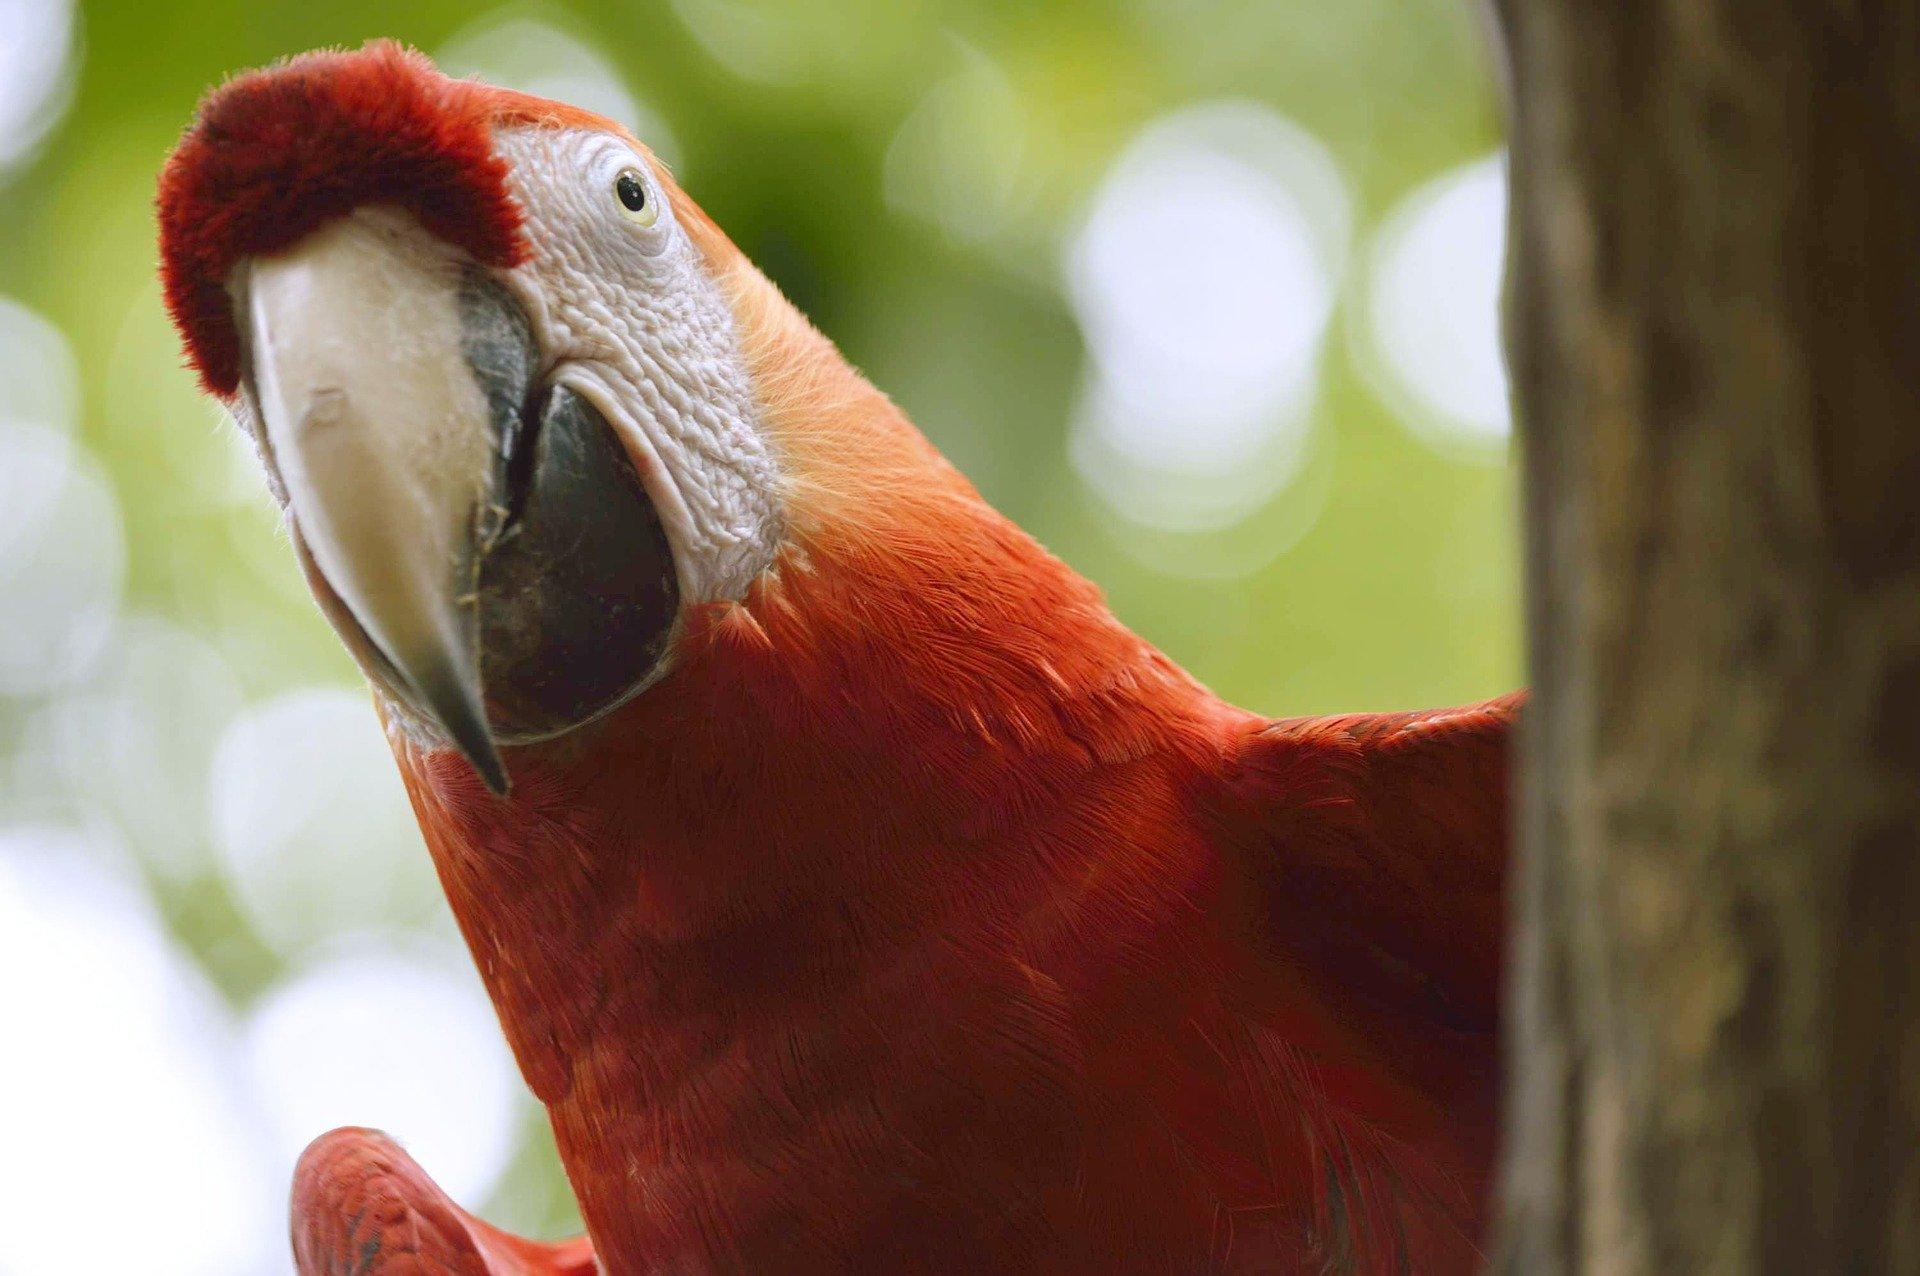 Putovanje Ekvador - Ekvador s Galapagosom (19)